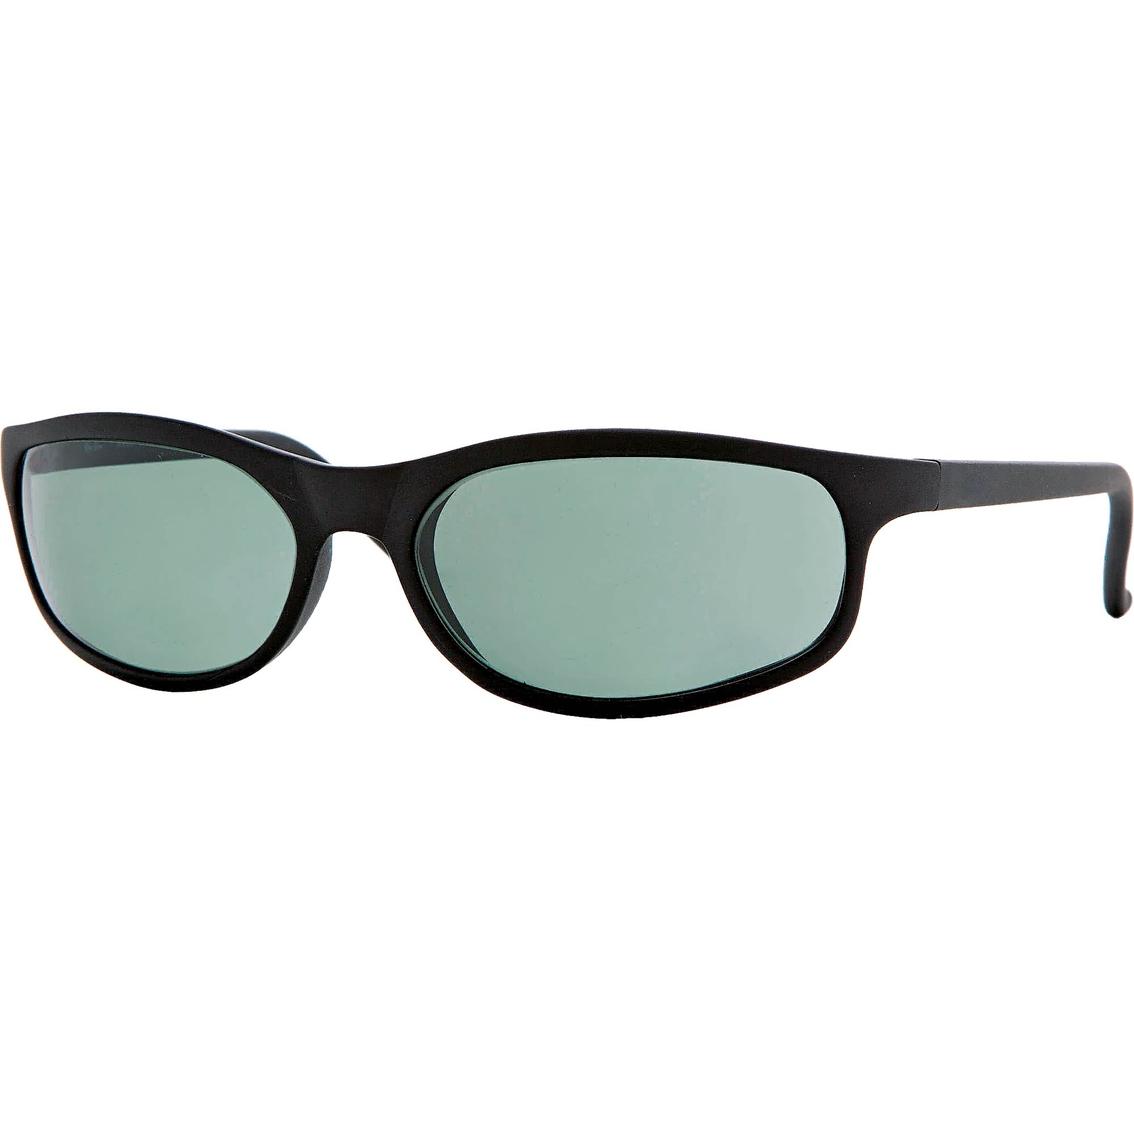 Ray-ban Predator 8 Sunglasses 0rb2030   Men's Sunglasses   Handbags & Accessories   Shop The ...